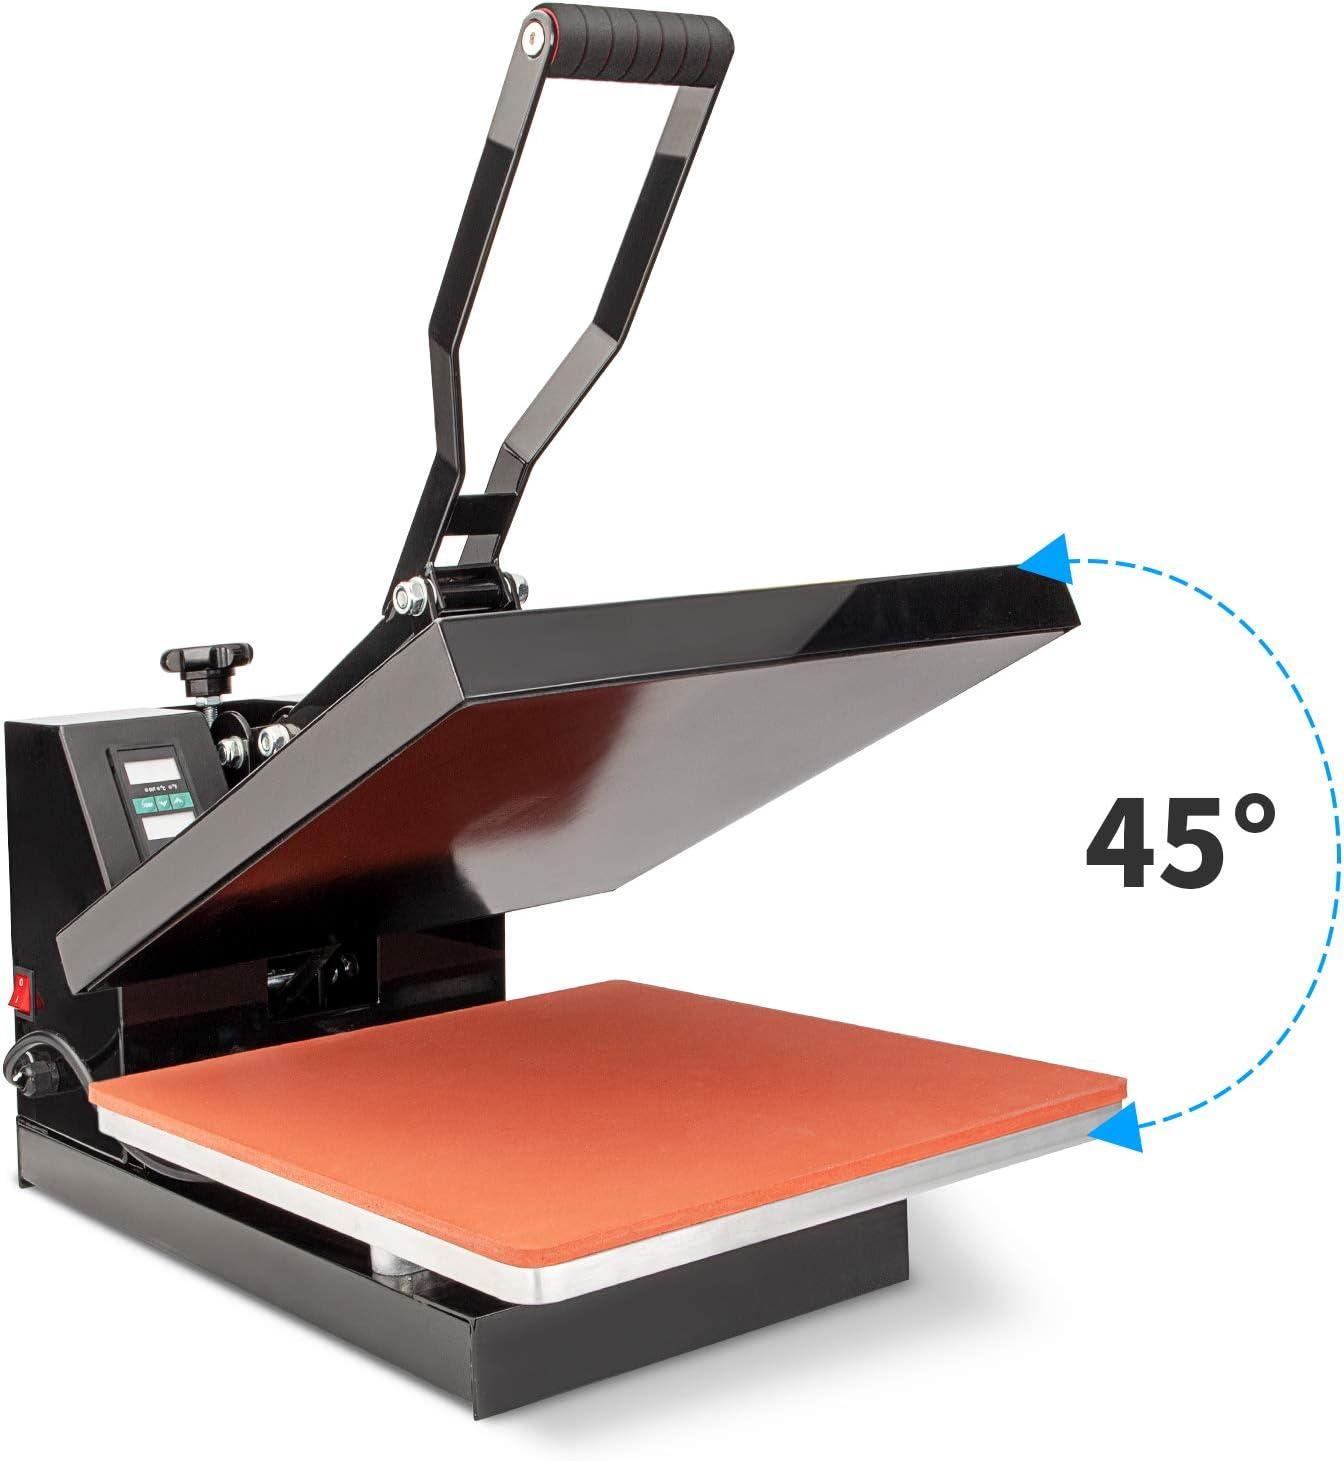 Heat Press Machine 15x15 inch 8 in 1 T-Shirt Digital Printing Transfer Sublimation Machine 1100W with Clothes Hat//Cap Plate Press Mug Press